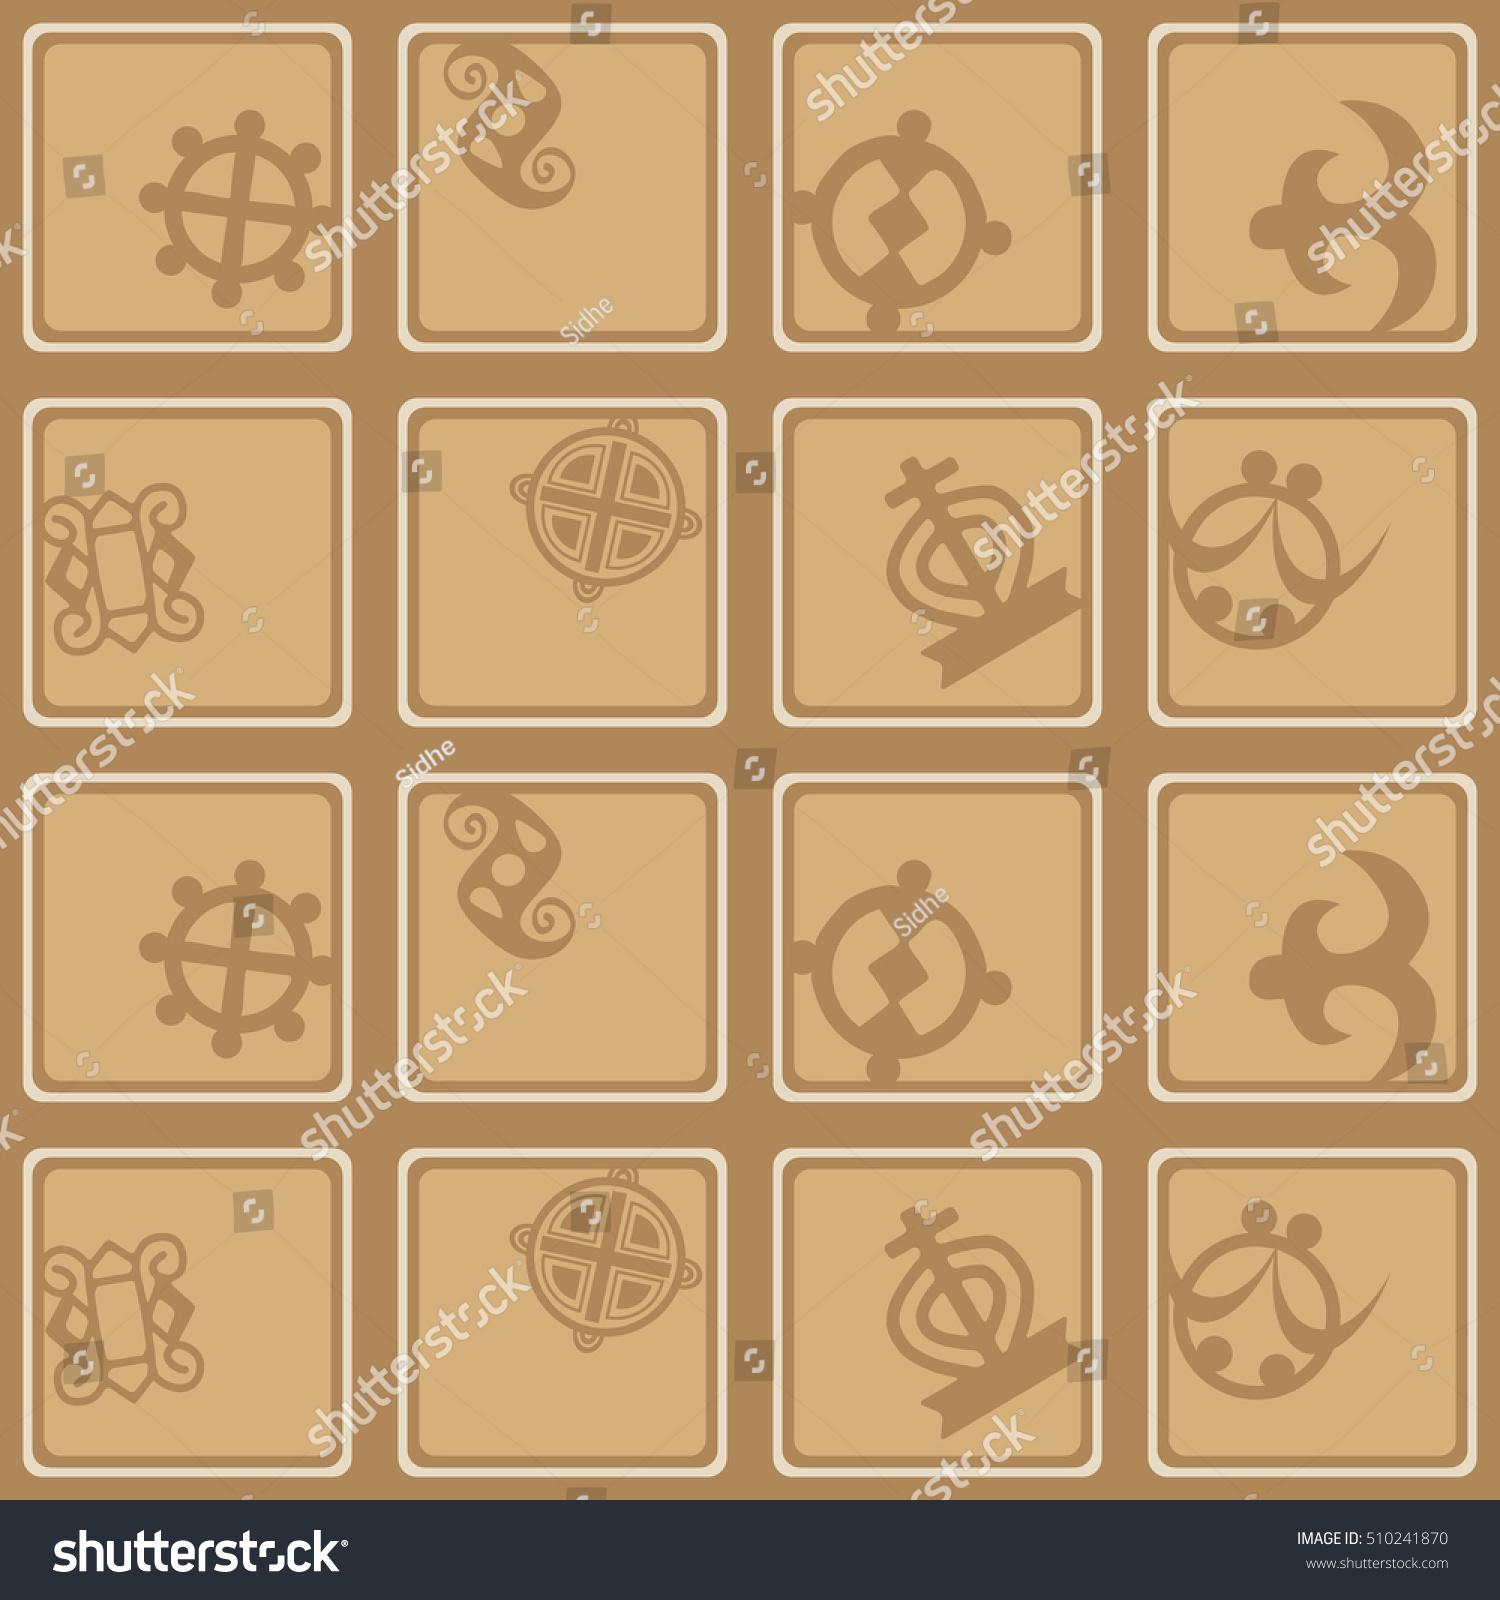 Seamless pattern adinkra symbols your design stock vector seamless pattern adinkra symbols your design stock vector 510241870 shutterstock biocorpaavc Images